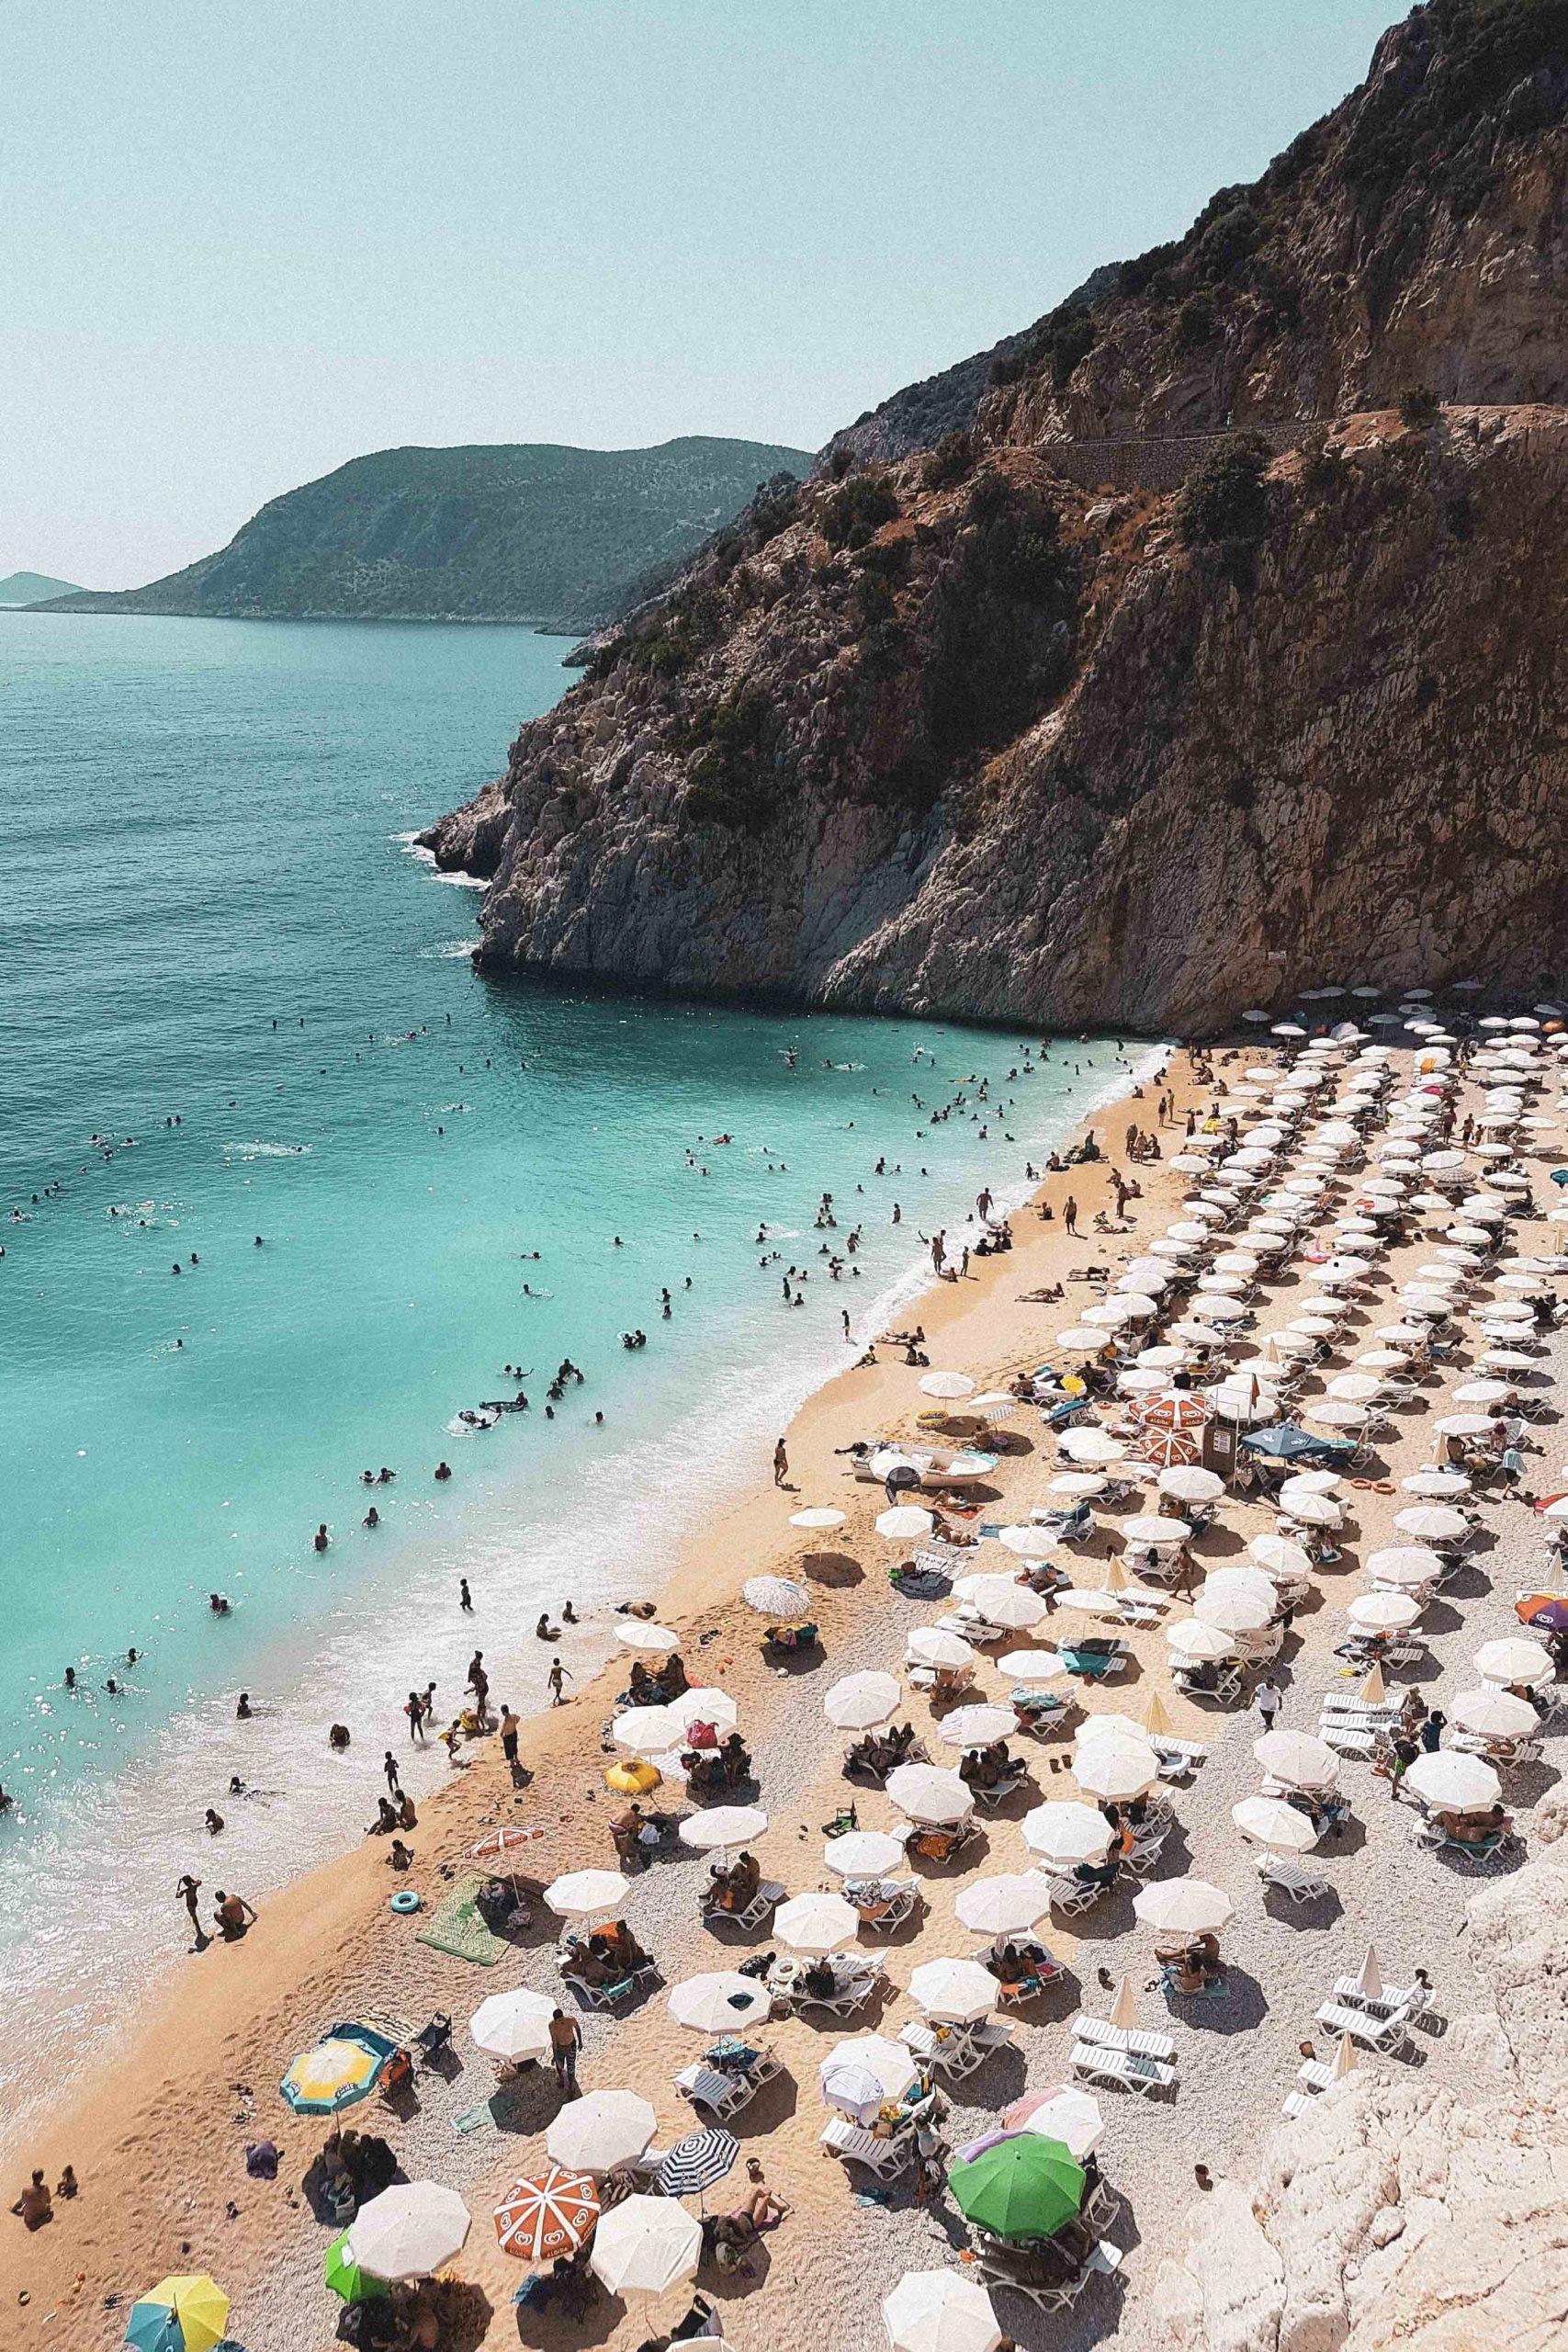 Beach with umbrellas and sunbeds in Antalya, Turkey